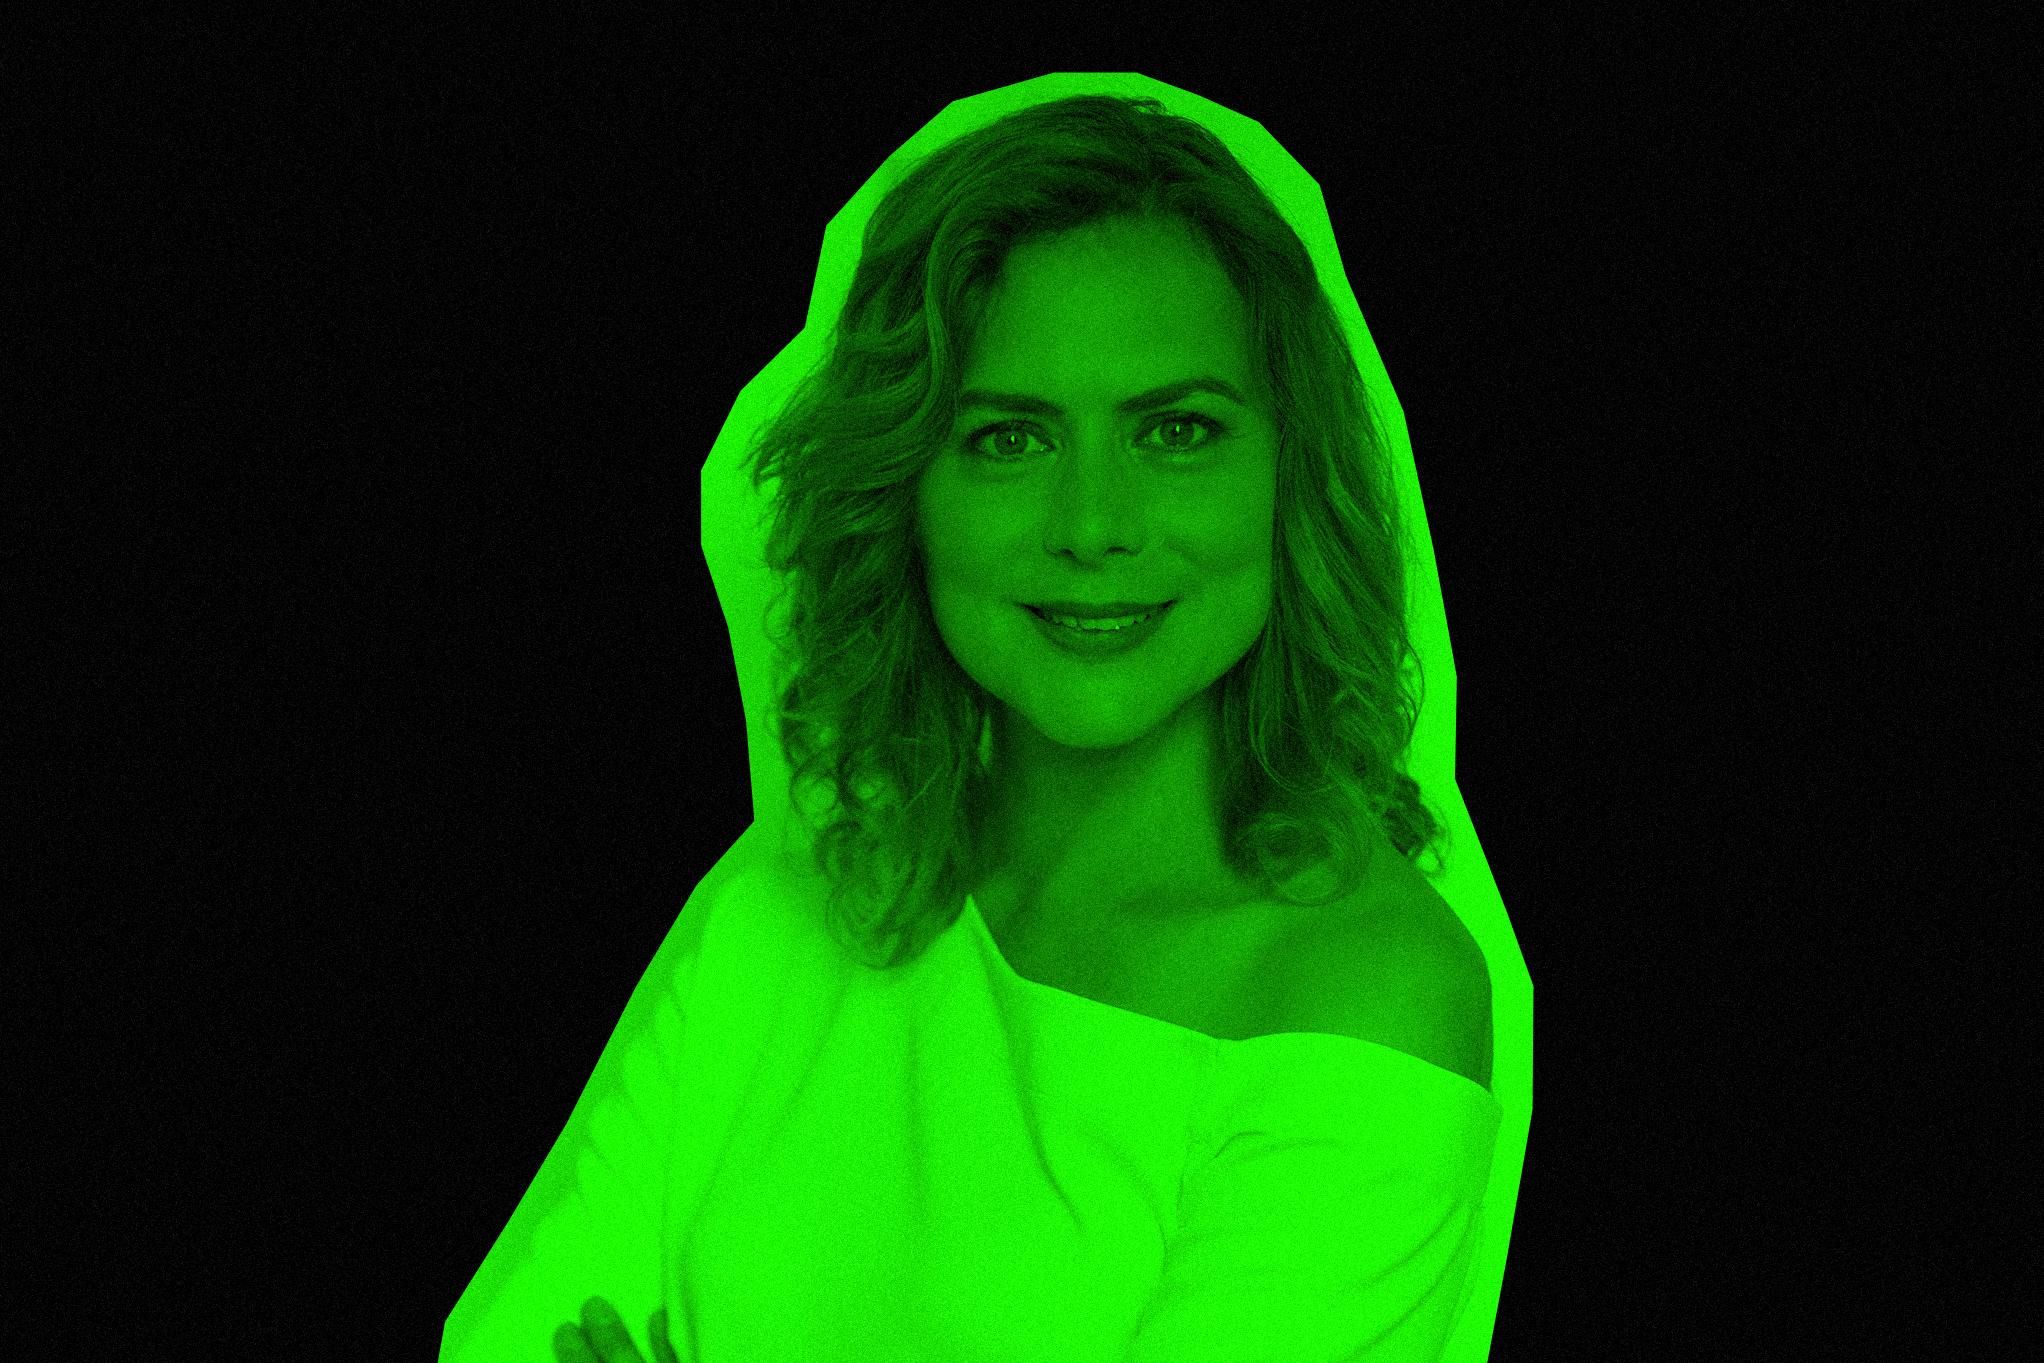 Nicole Palo